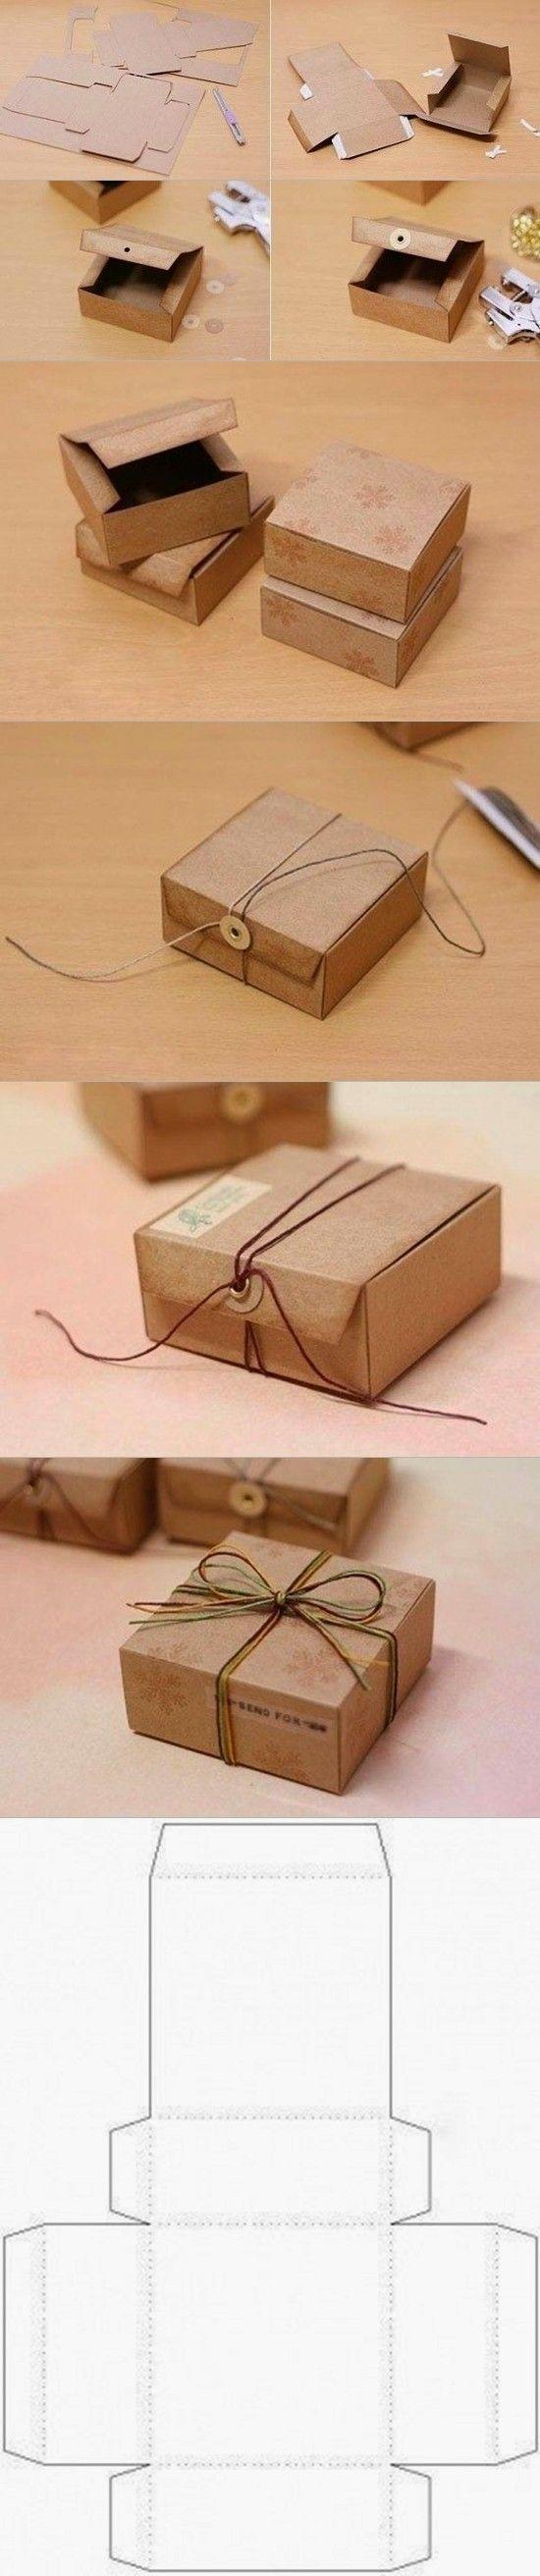 10 ideas para envolver tus regalos   Aprender manualidades es facilisimo.com